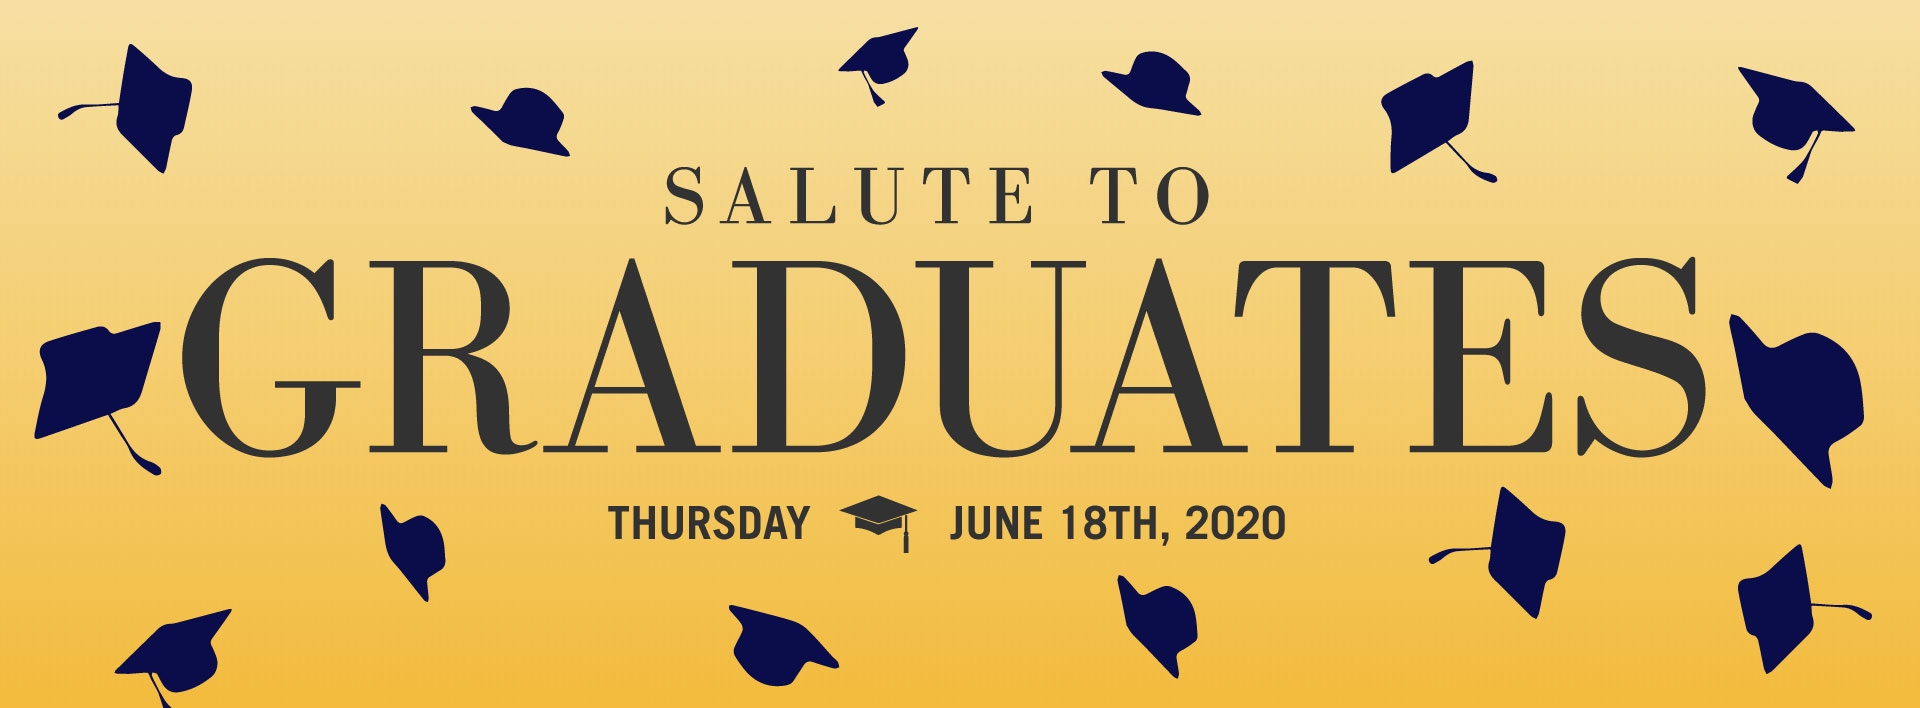 Salute to Graduates ceremony, june 18 at 10 am